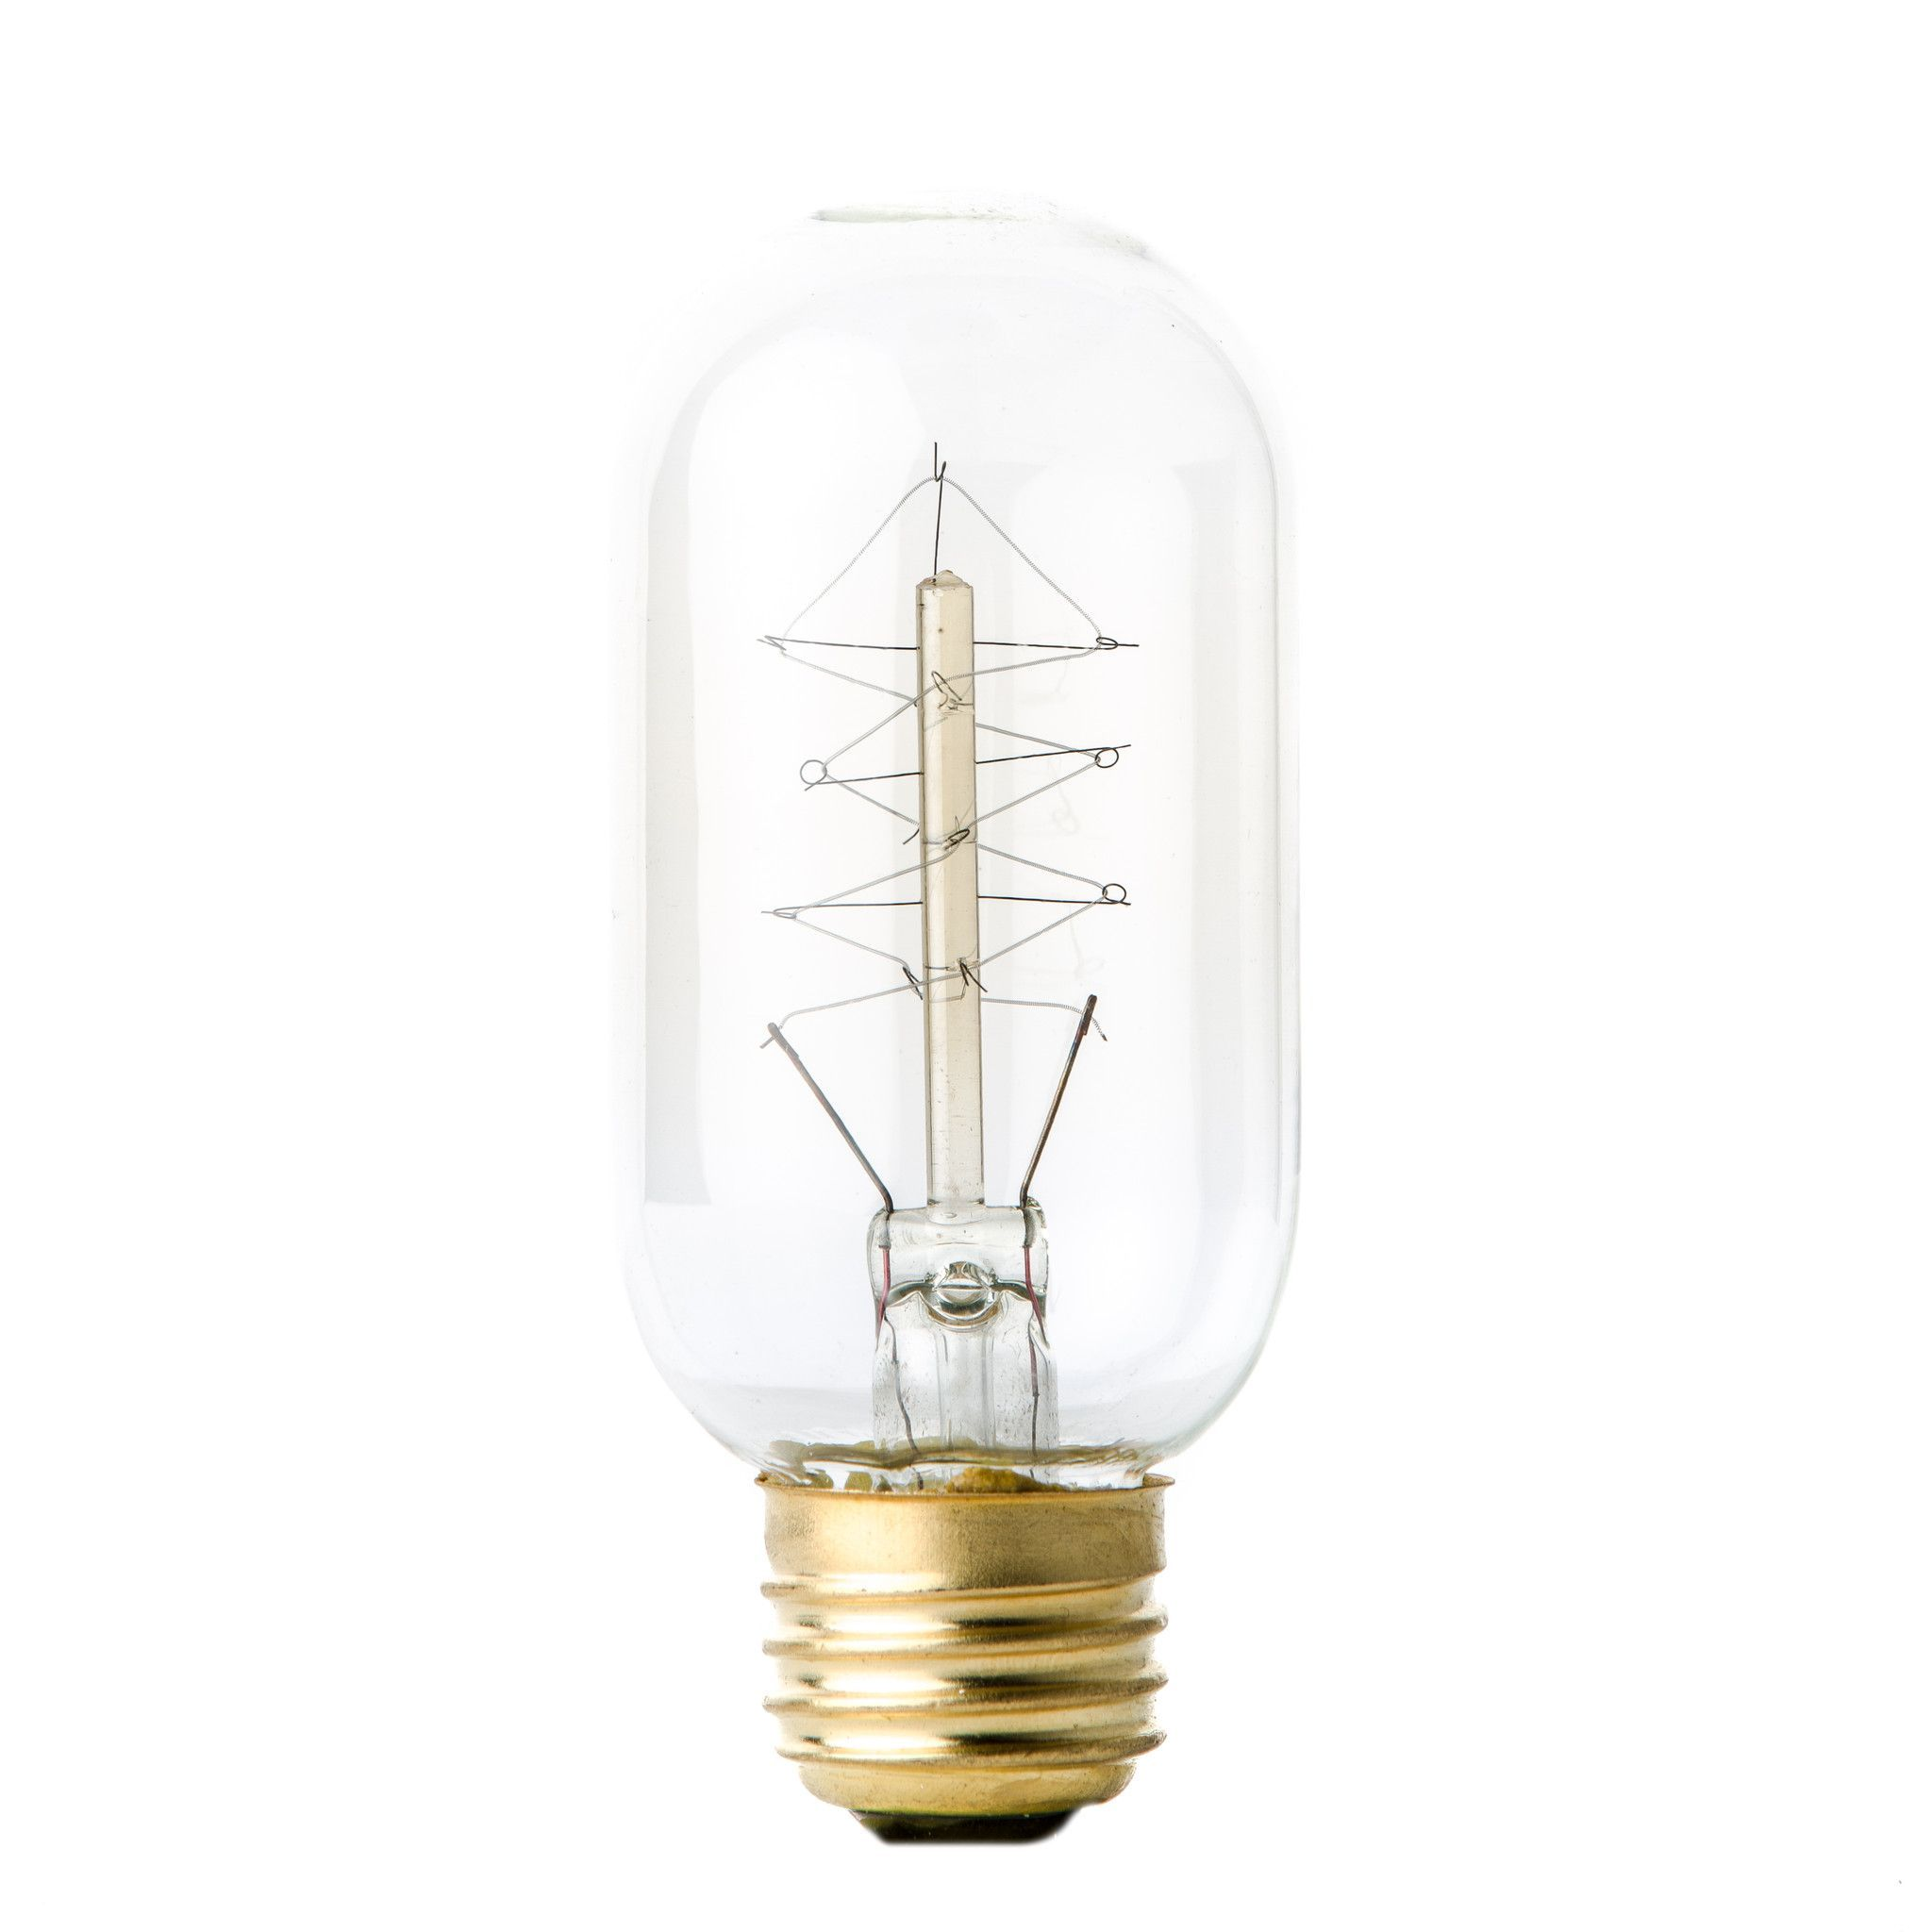 Bulb photo